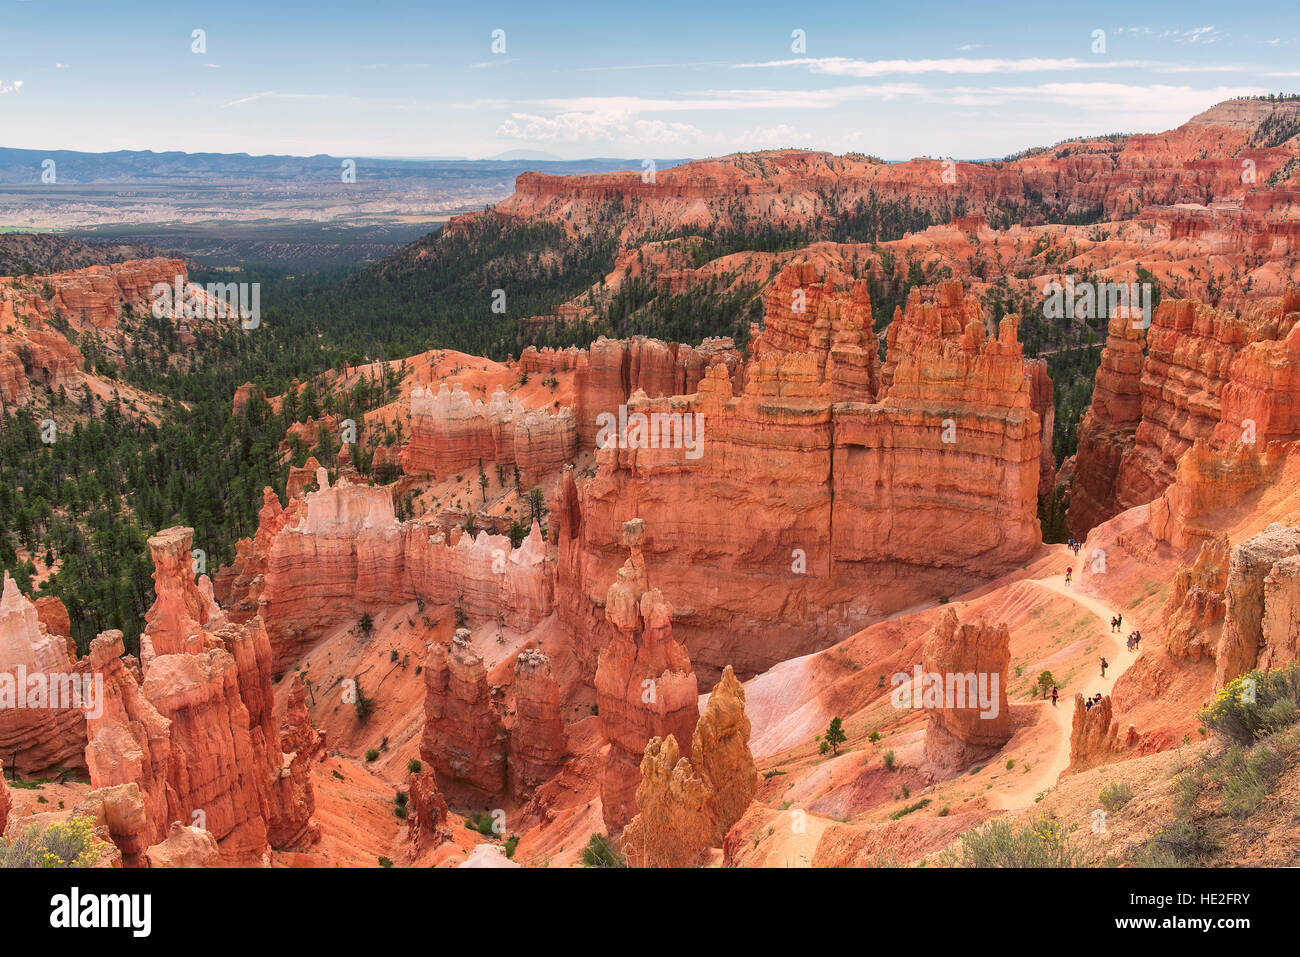 Bryce Amphitheater, Bryce Canyon National Park, Utah, USA - Stock Image